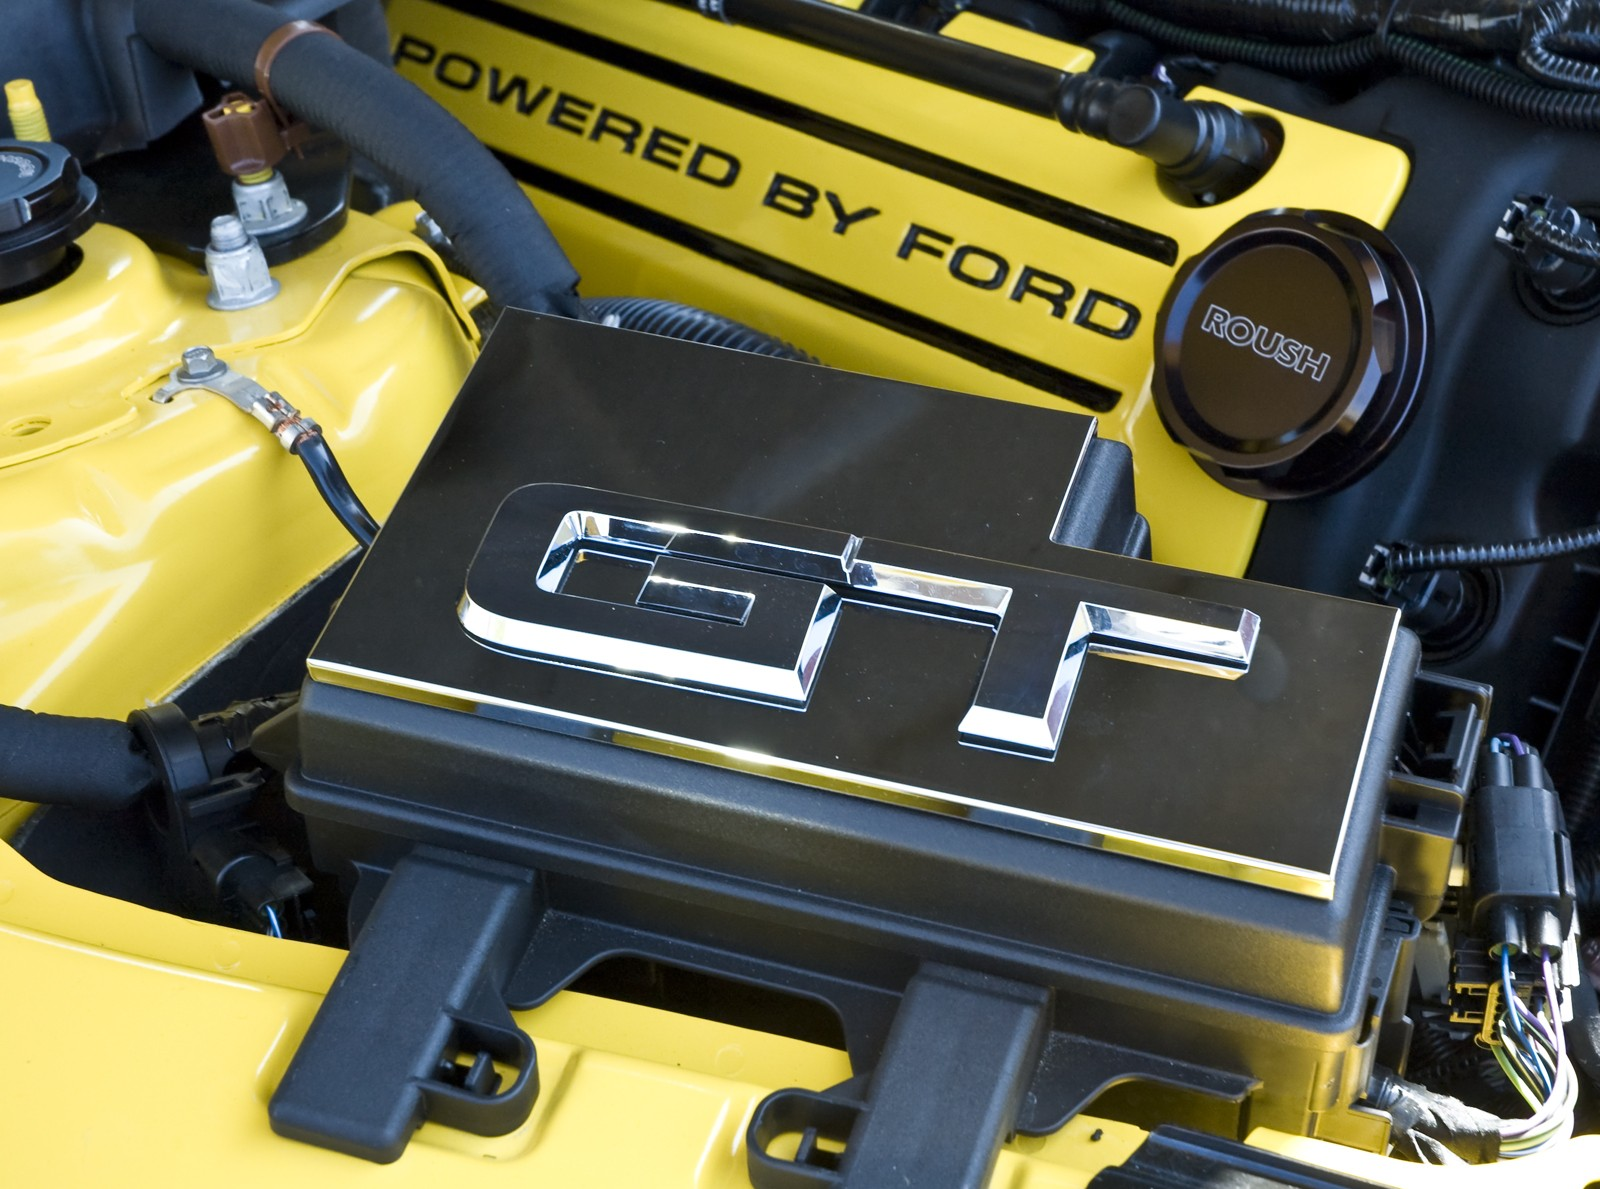 2015 2017 Mustang Chrome Billet Aluminum Engine Fuse Box Cover W 2002 Gt Oem Emblem